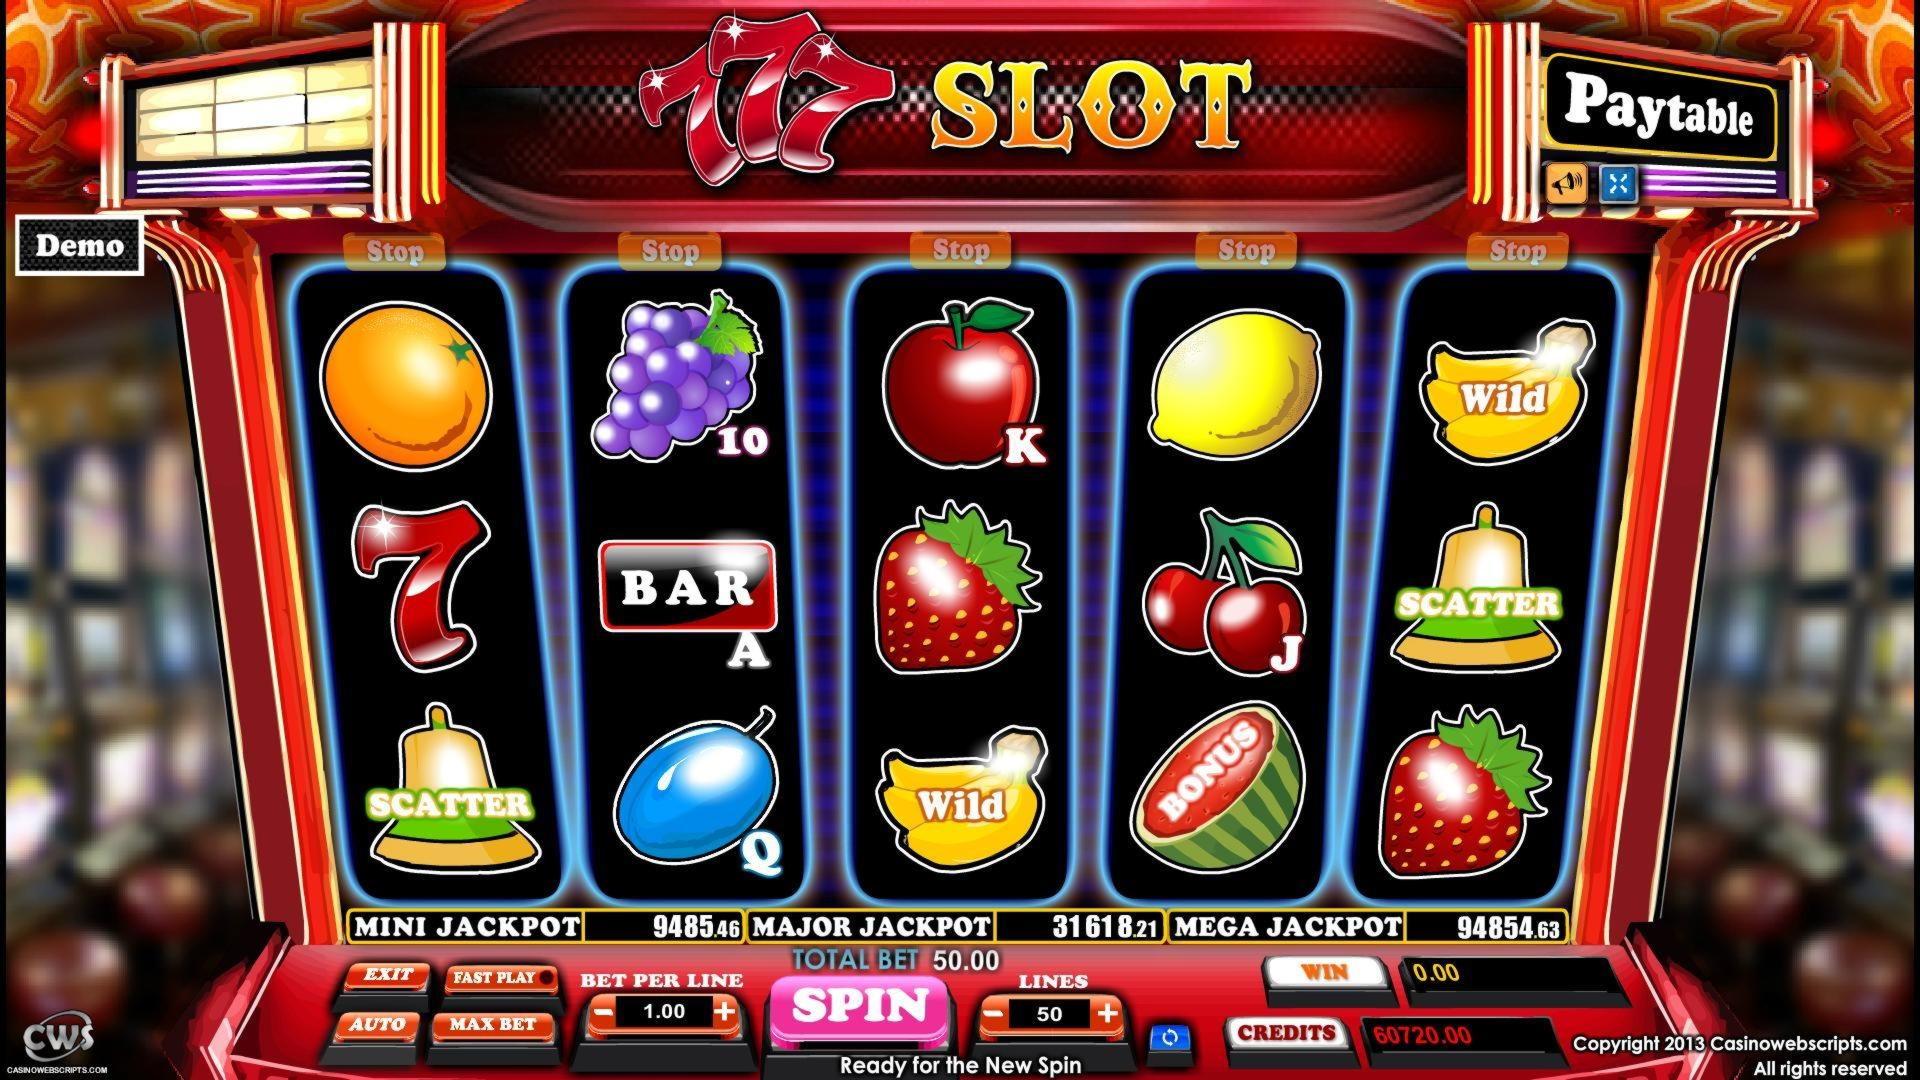 820 Casino- ի Բարի գալուստ Բոնուս `Կուսակցության Խաղատուն